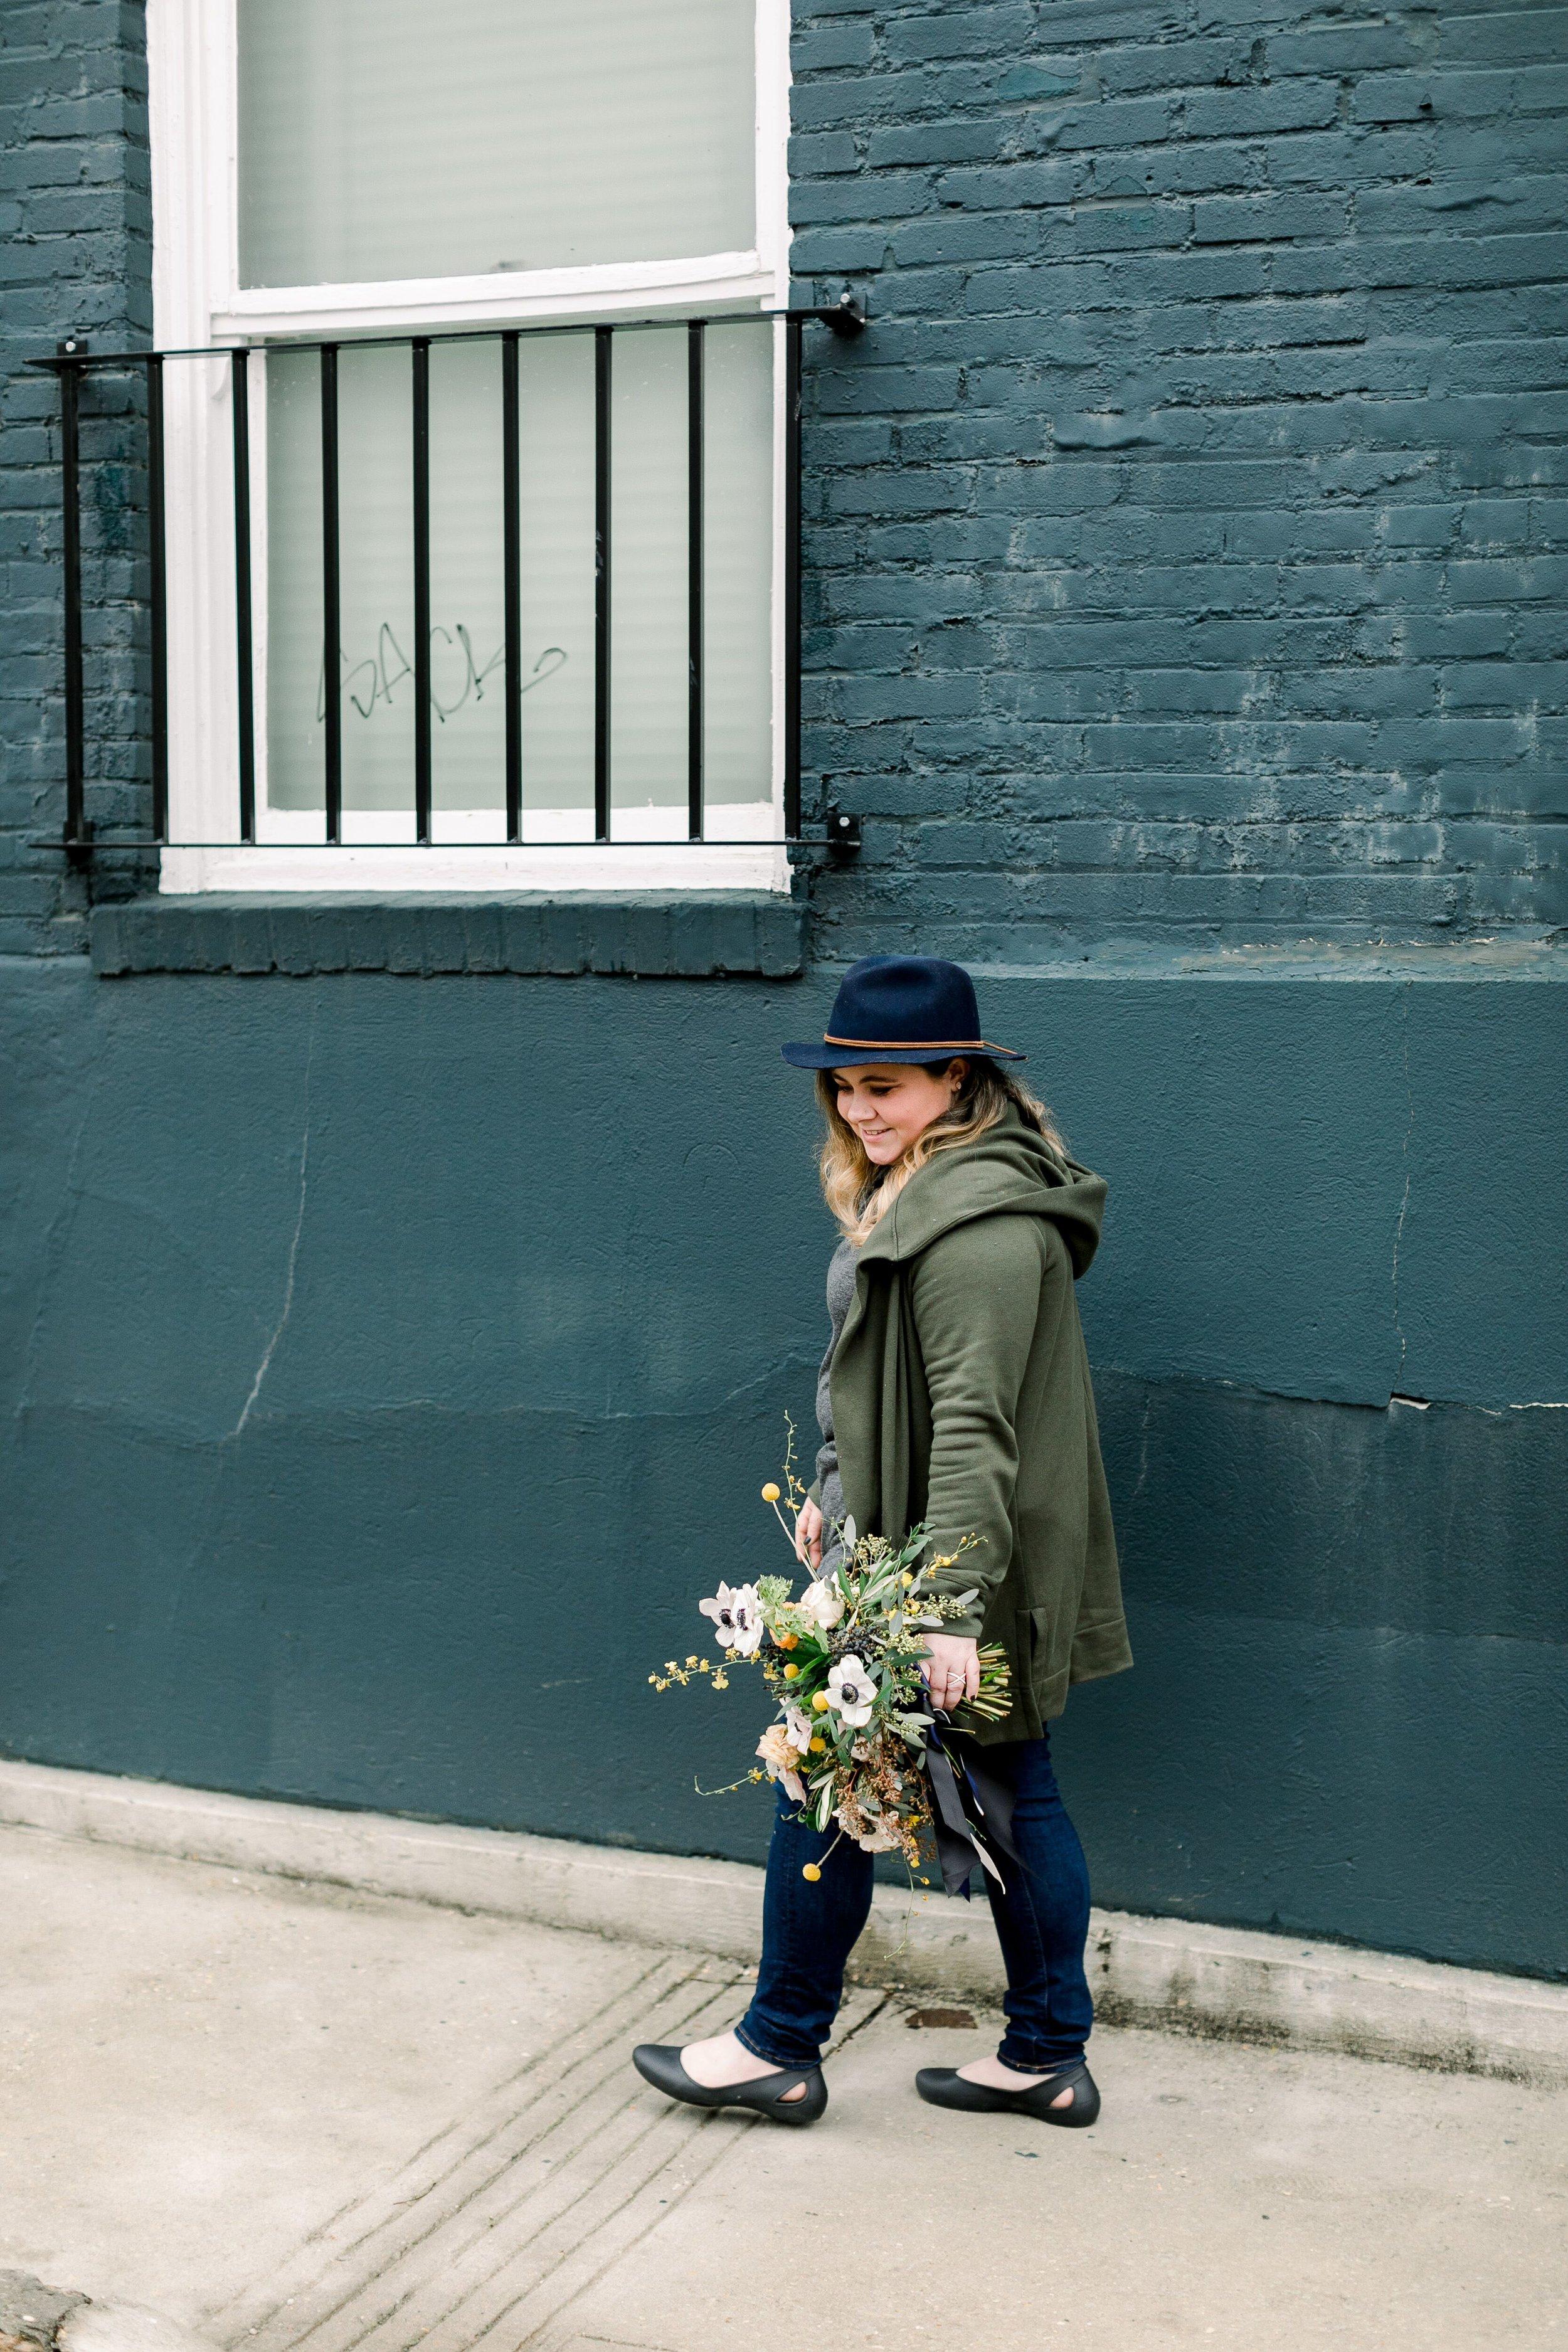 Memphis-Wedding-Planner-Wedding-Day-Manager-Florist-Wedding-Designer-Wedding-Coordinator- Floral-Curator-Kelsey-Connor-Mary-Kate-Steele-Photography